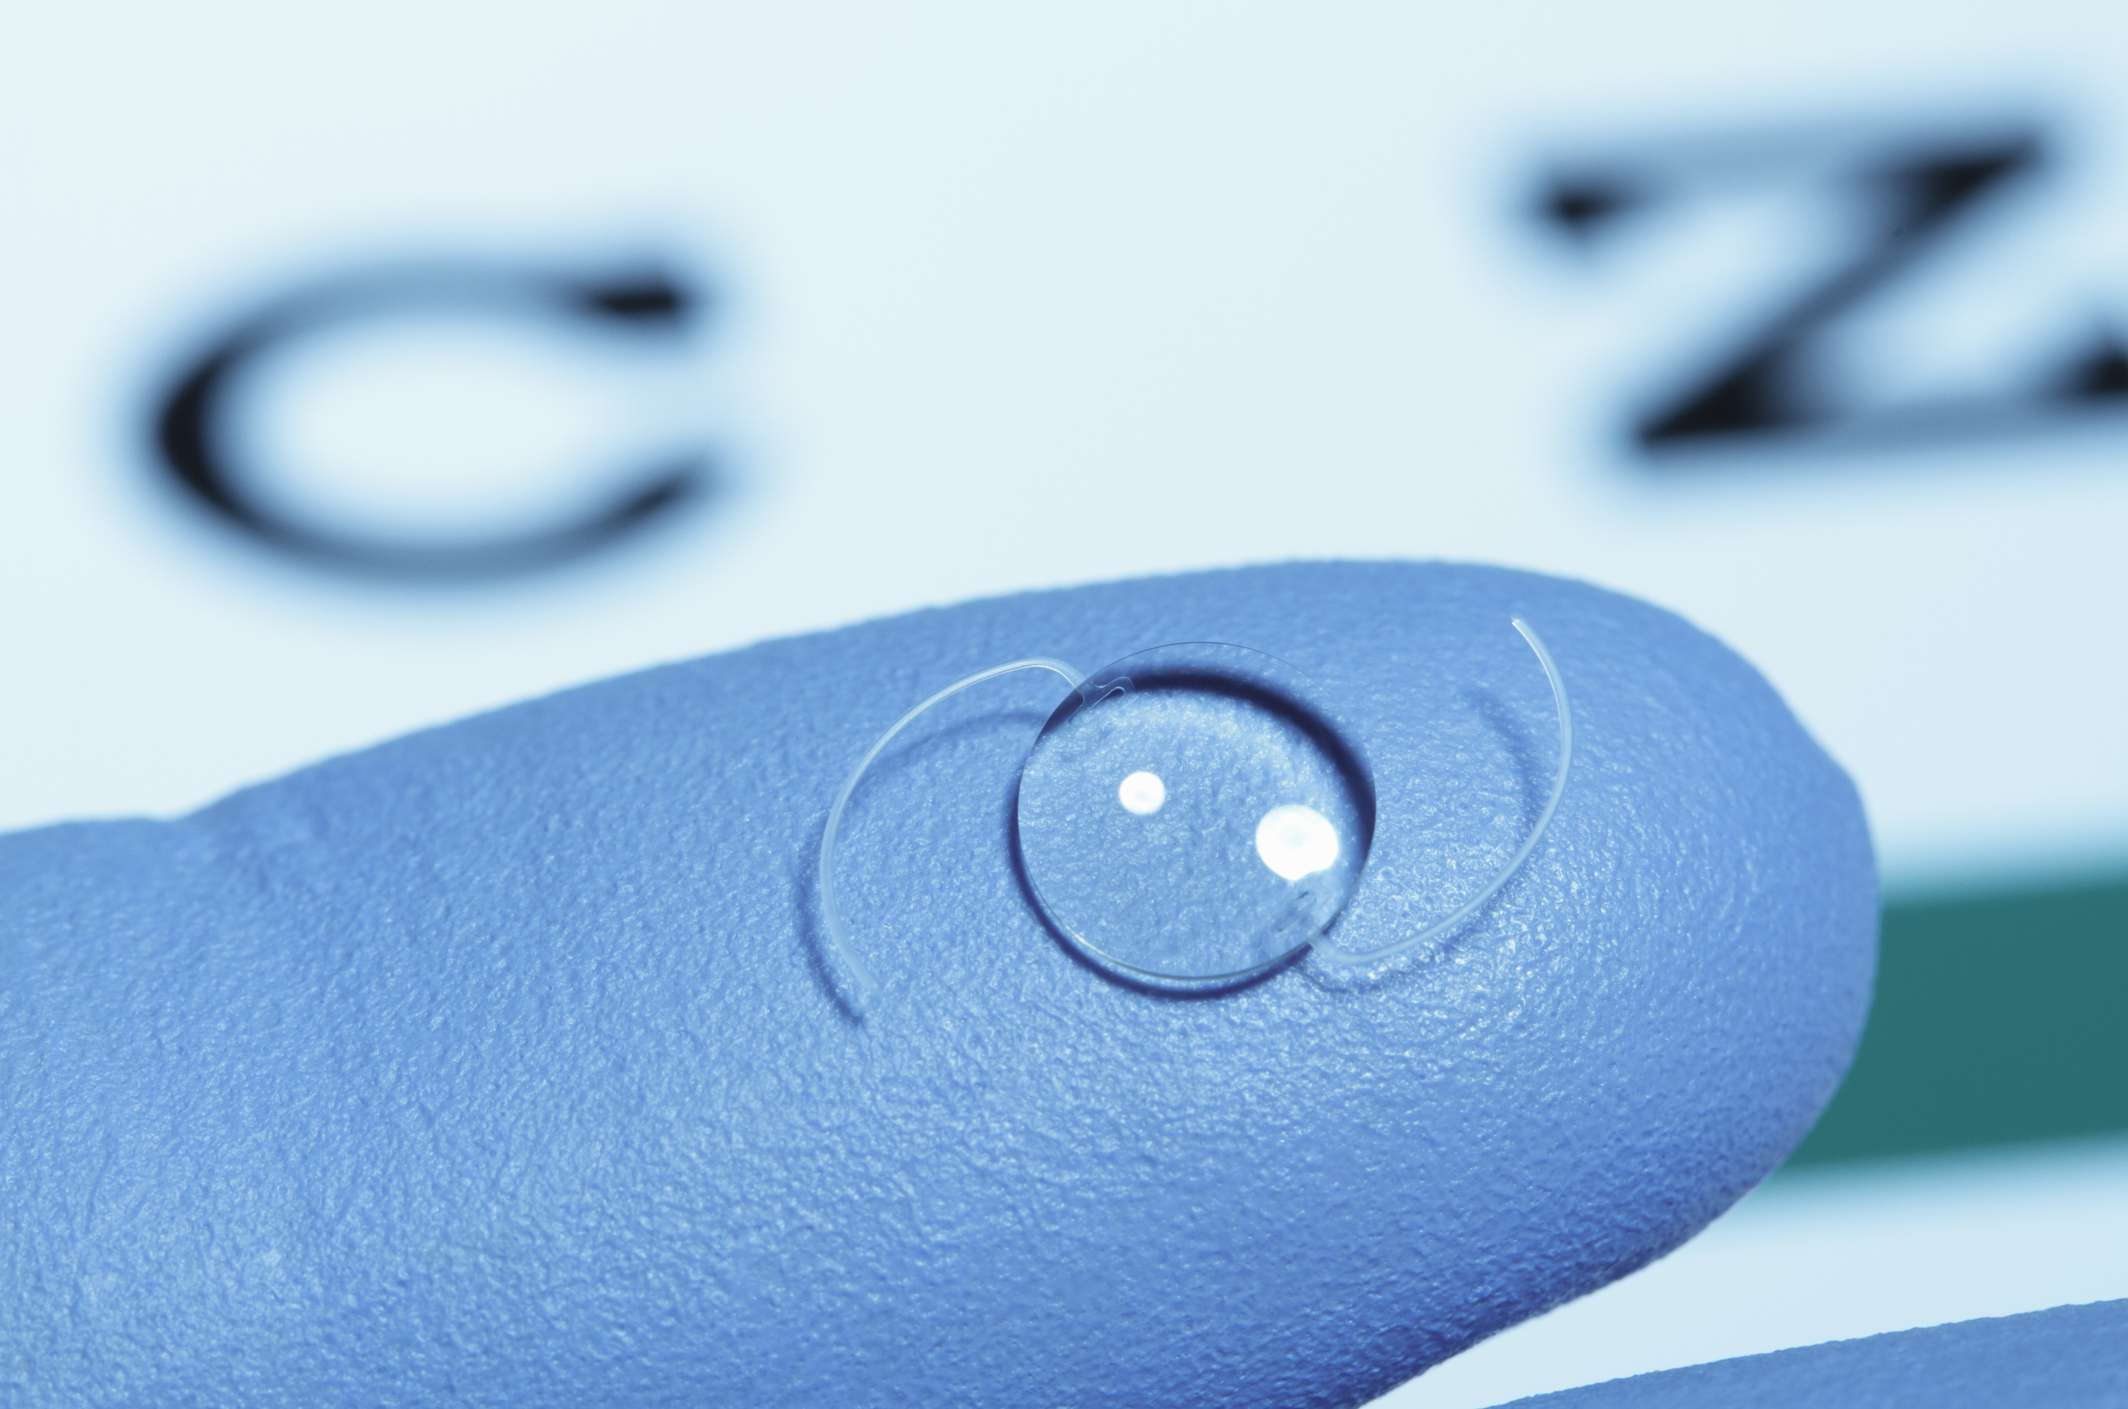 Intraocular (artificial) lens on gloved finger.